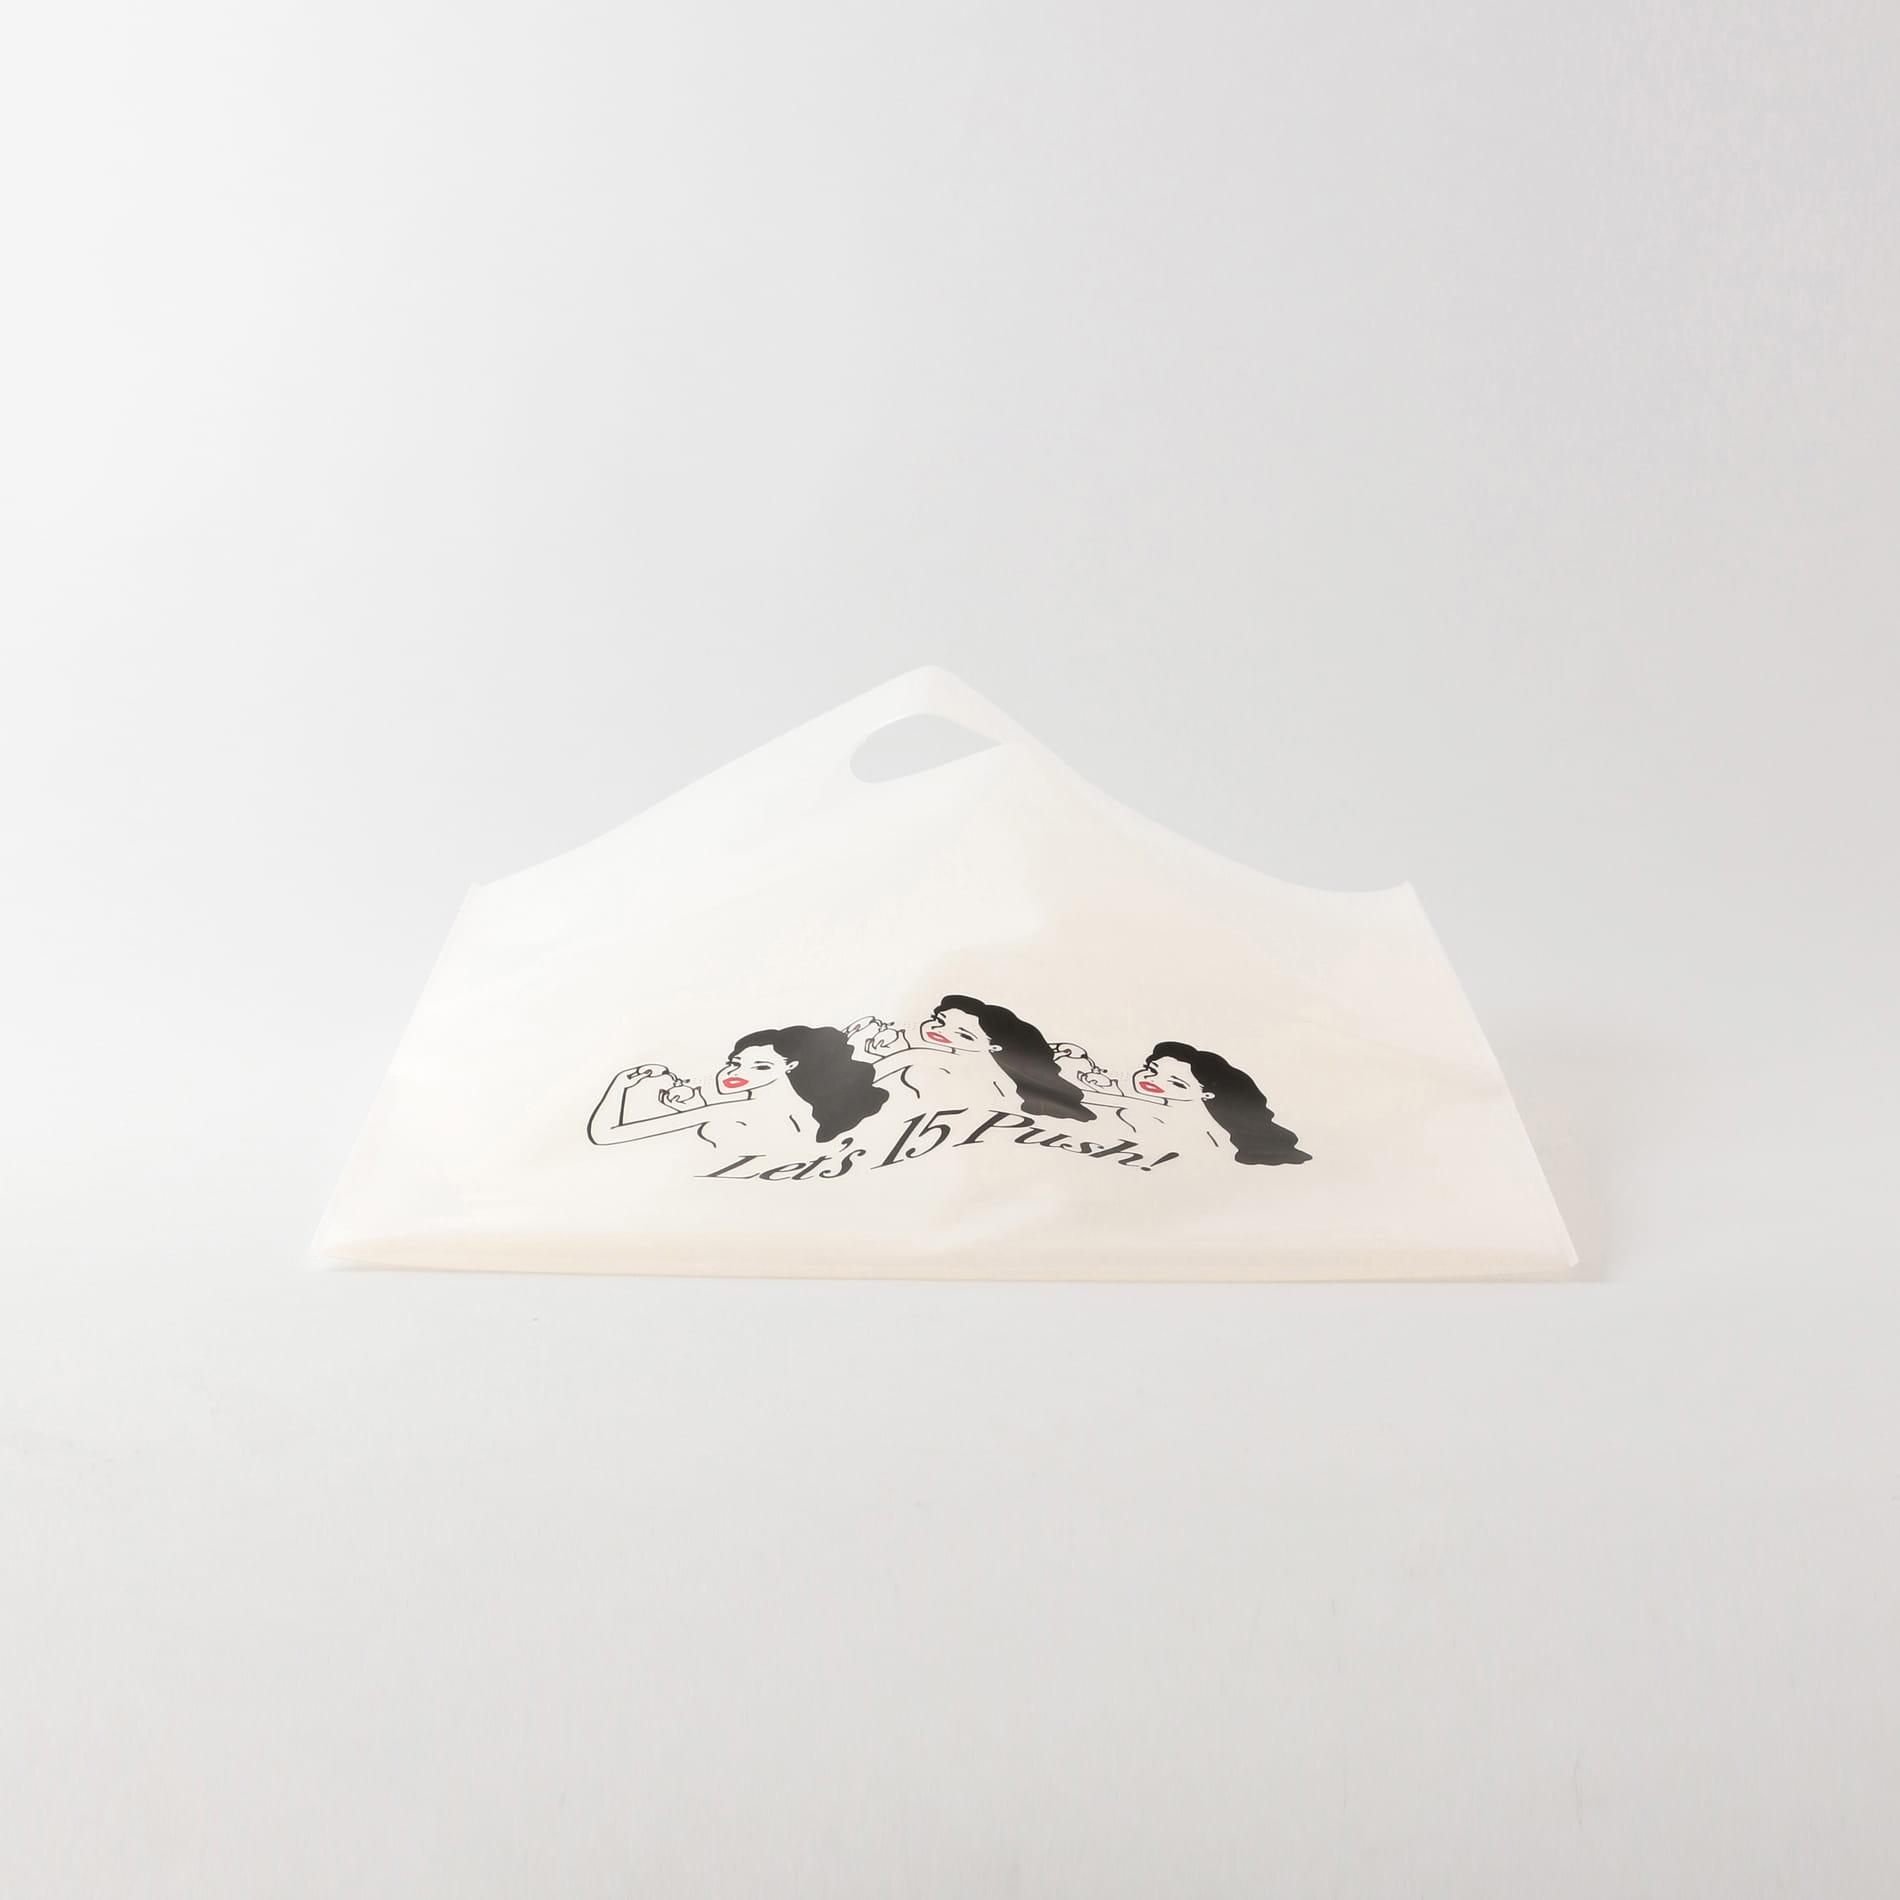 【LOVELESS×NO PANTIES】コラボ PVCバッグ